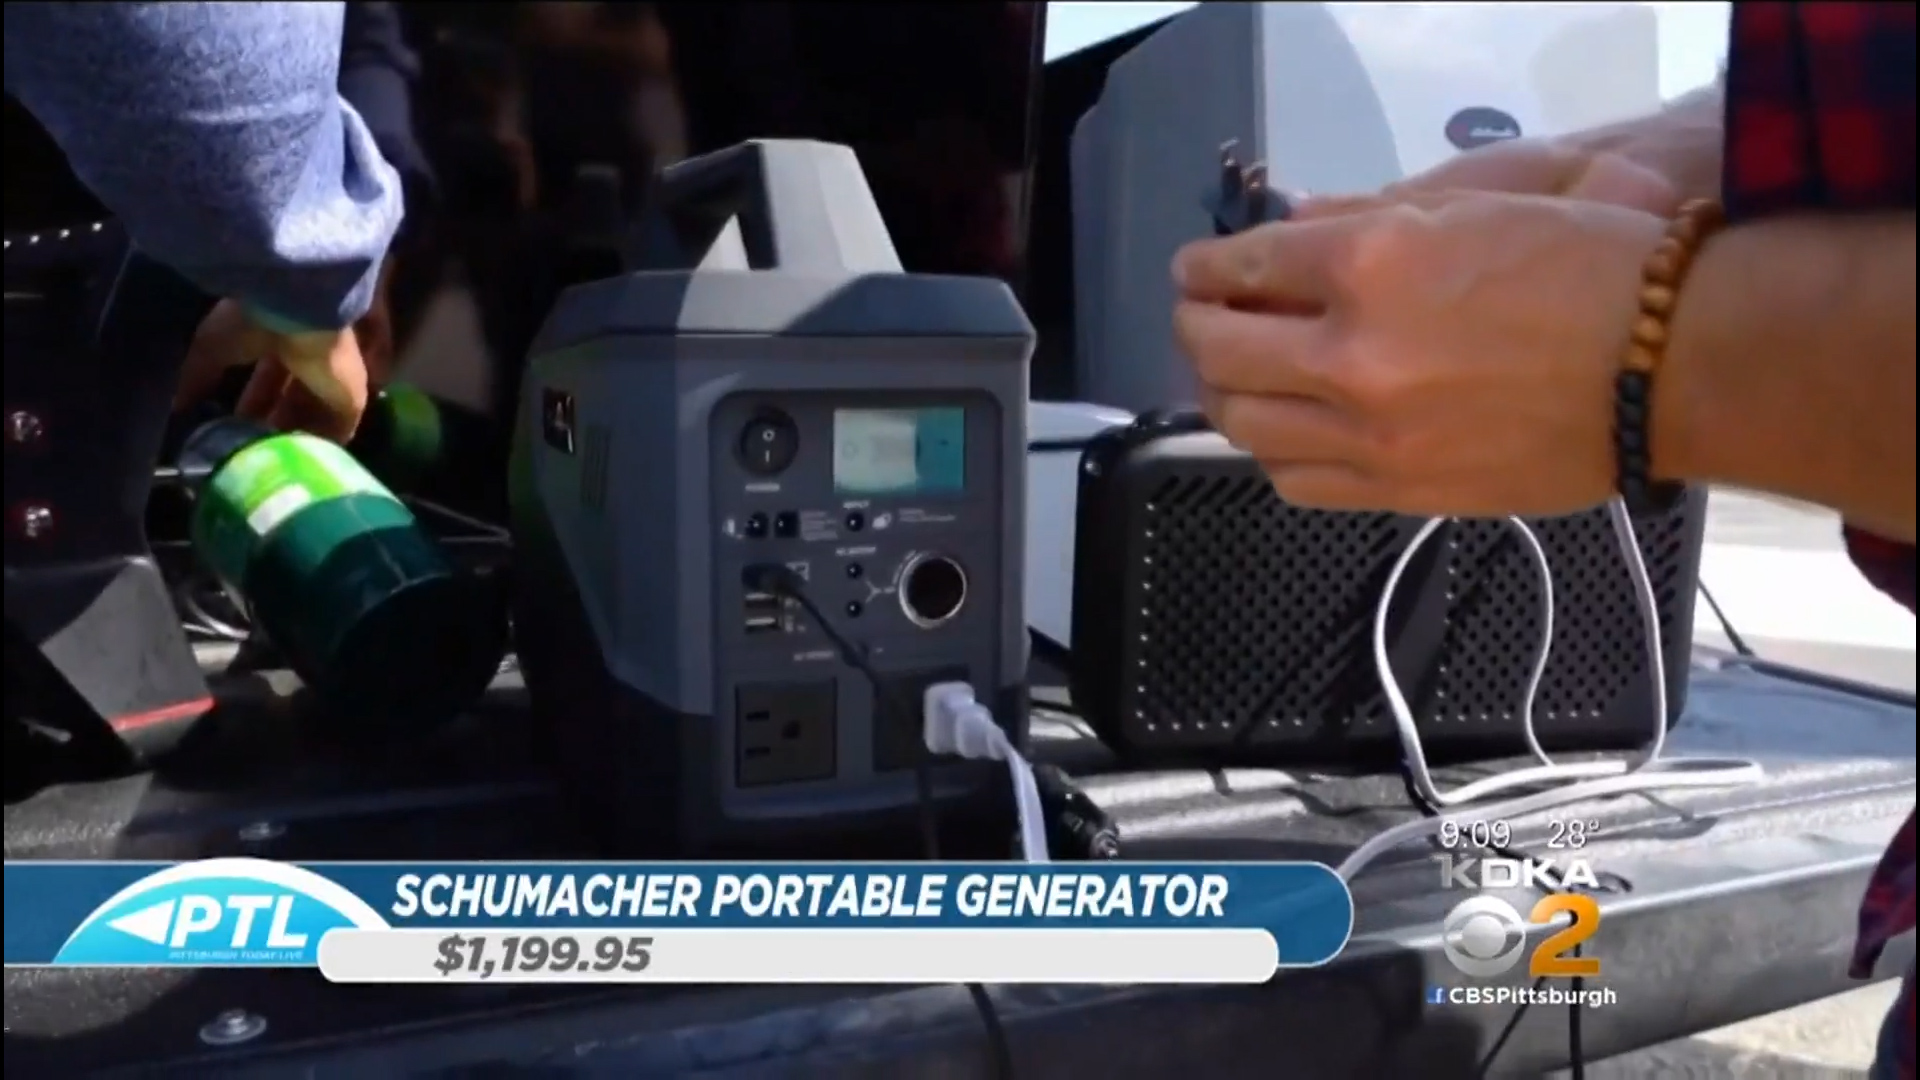 SCHUMACHER SL1404 PORTABLE GENERATOR/SOLAR - $1,199.95Shop Now